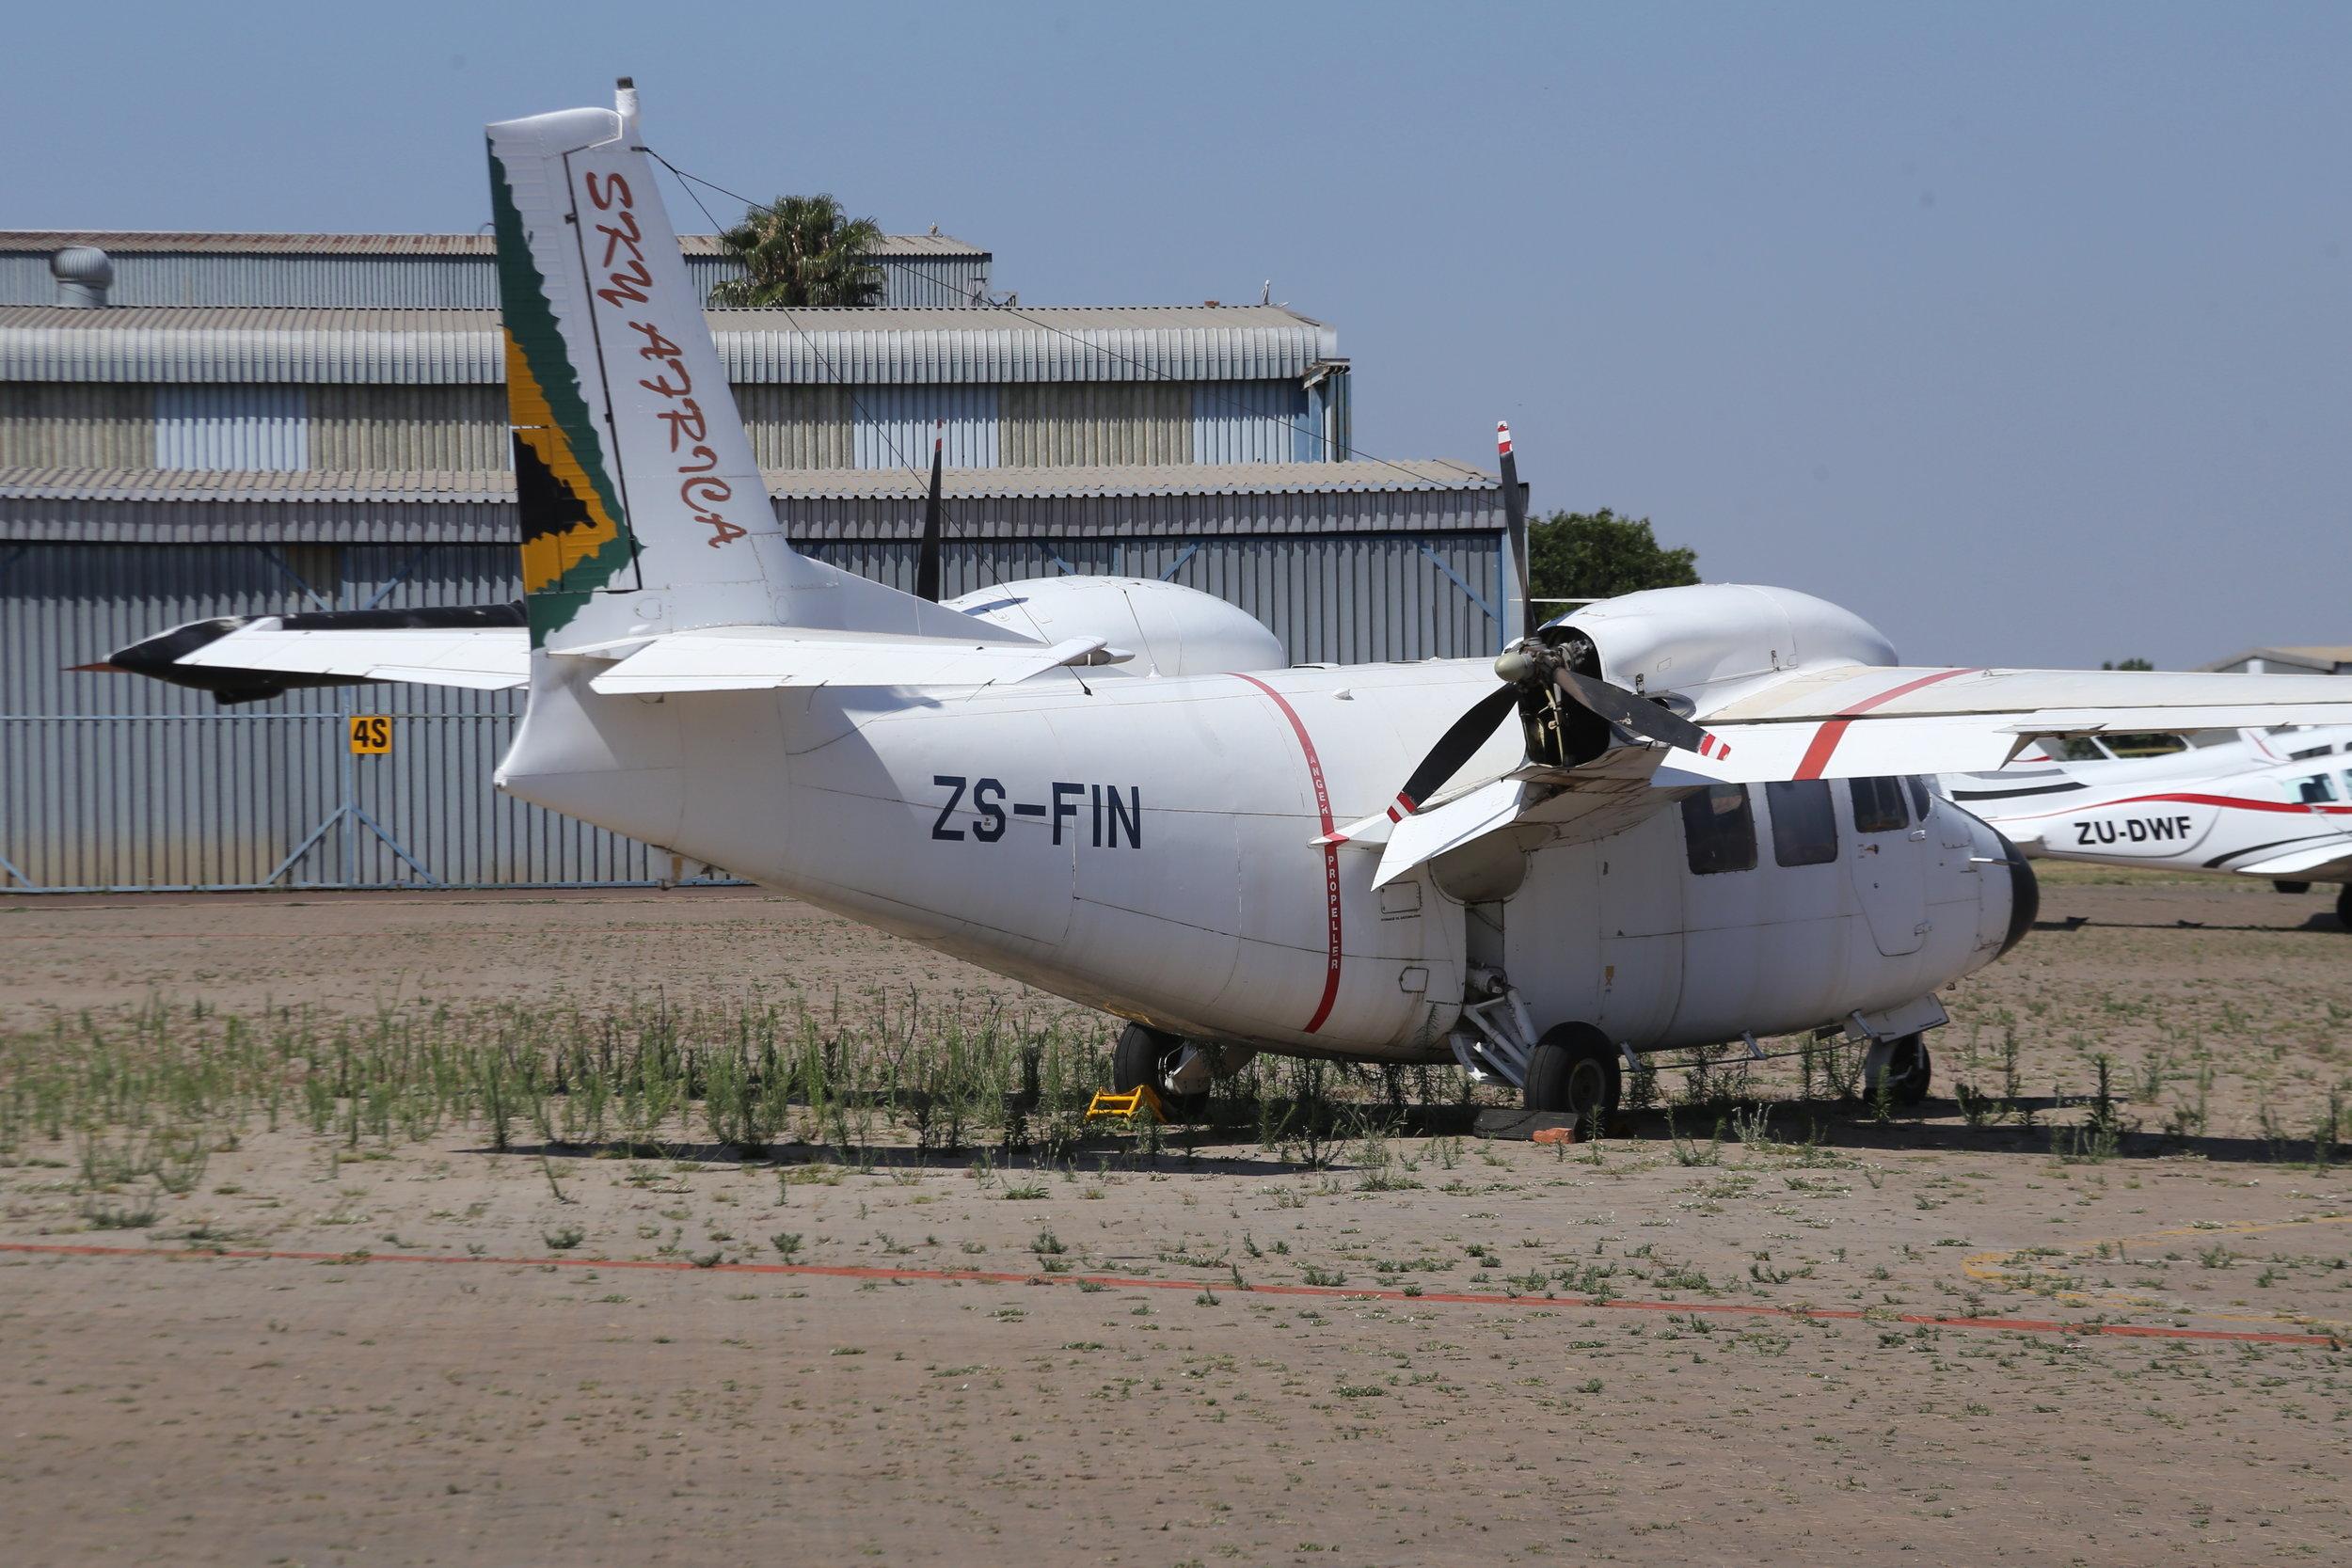 ZS-FIN Sky Africa Piaggio P166 Albatross taken at Wonderboom 12th Noevmebr 2018 by John Wood